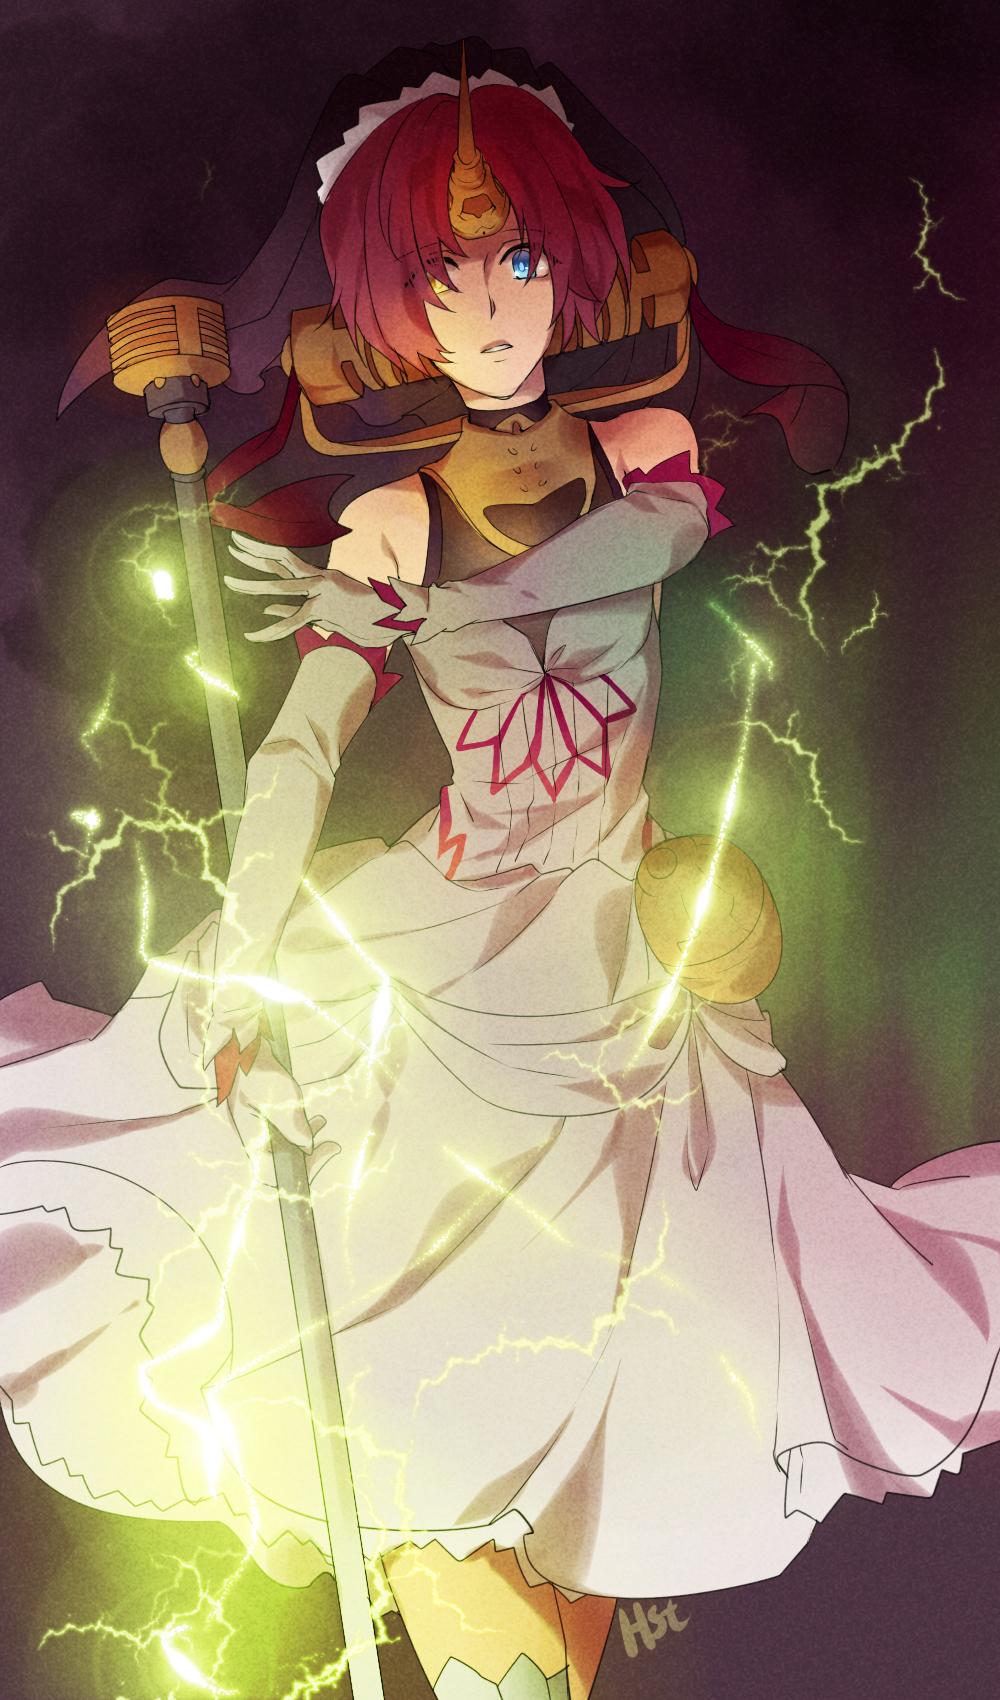 Tags Anime Goldprin Fate Grand Order Black Berserker Wedding Dress Anime Anime Images Berserker Fate Frankenstein fate apocrypha wallpaper